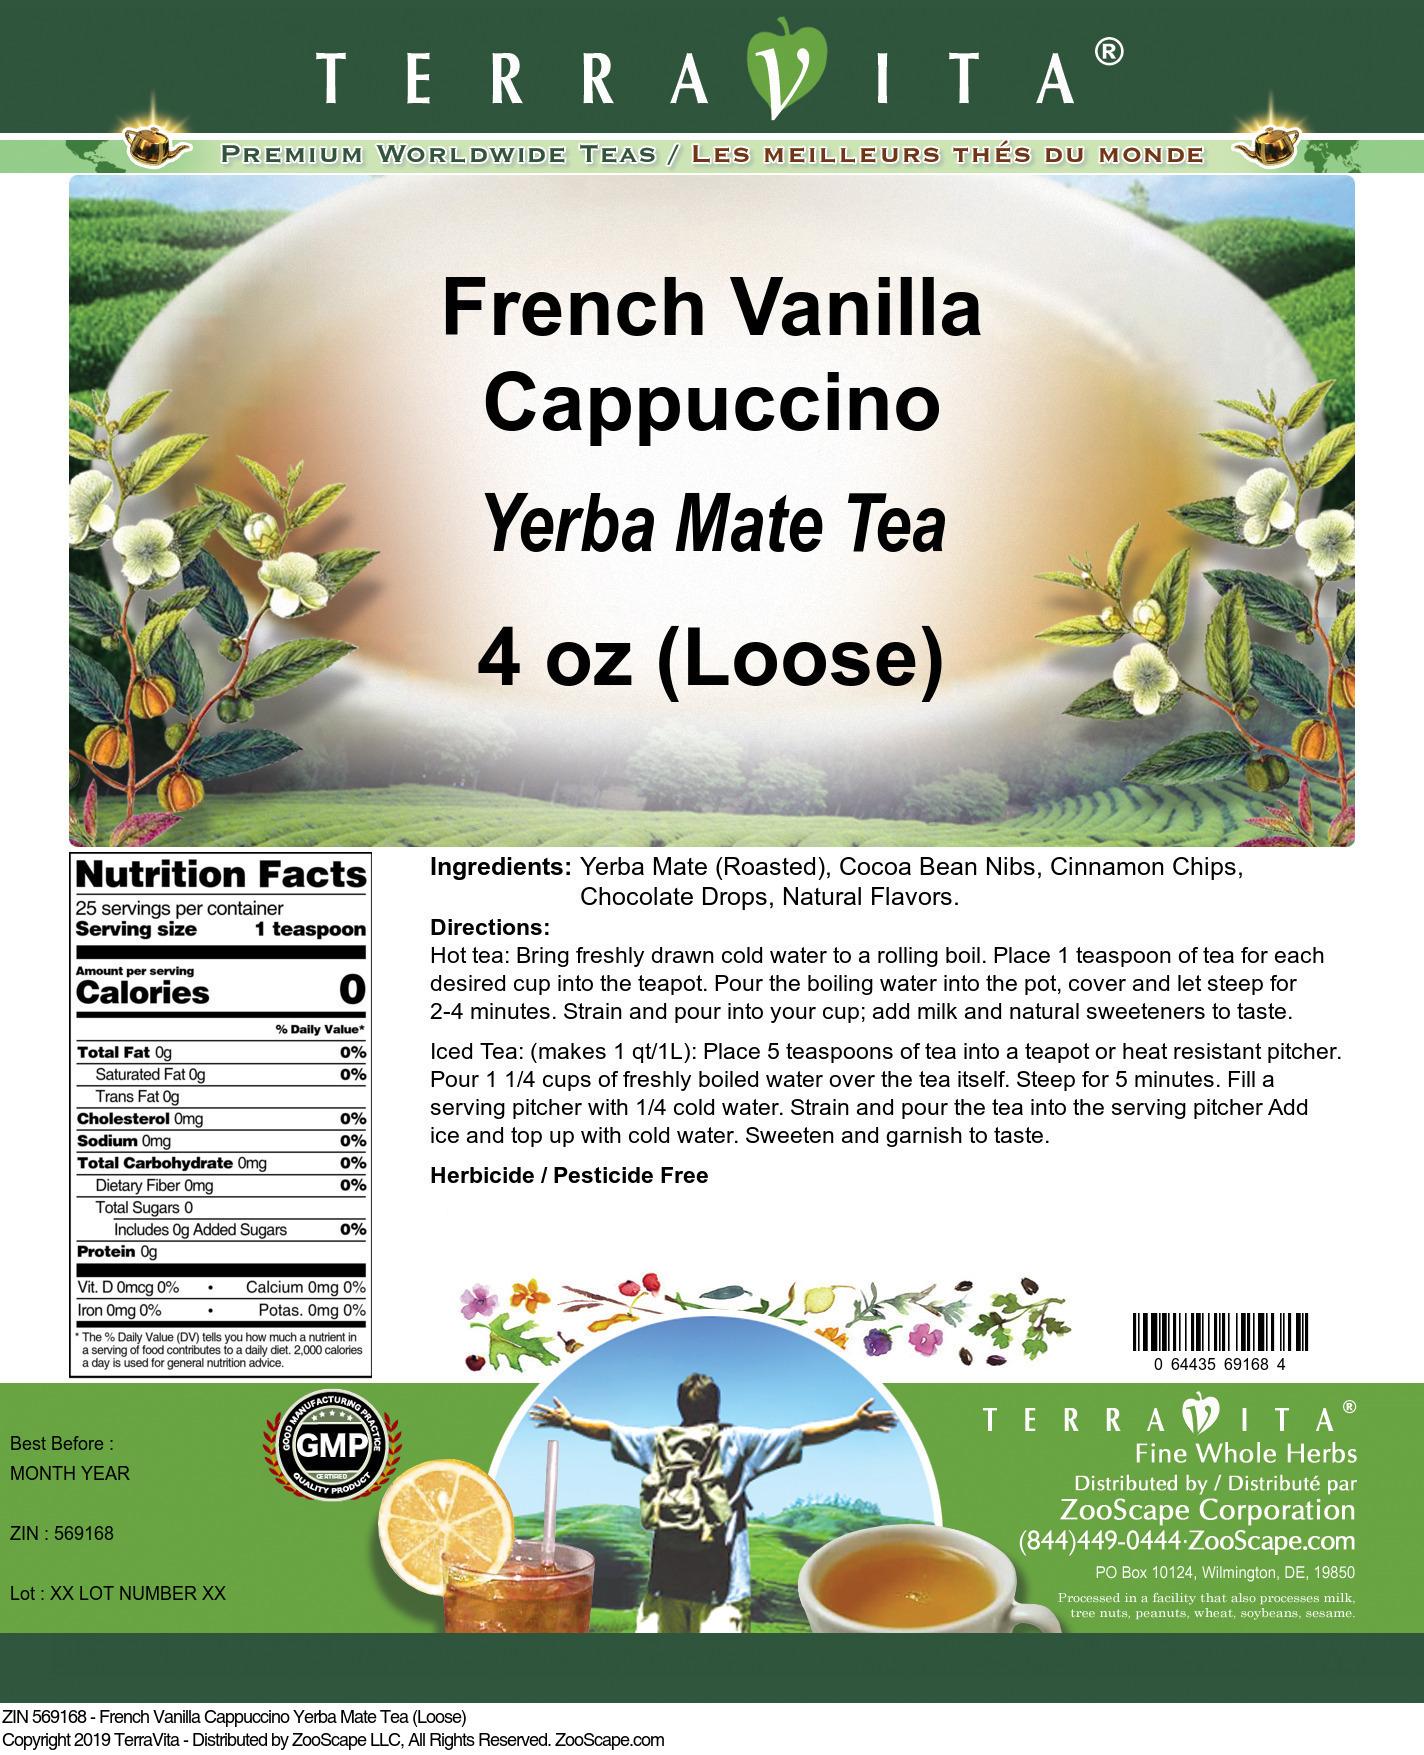 French Vanilla Cappuccino Yerba Mate